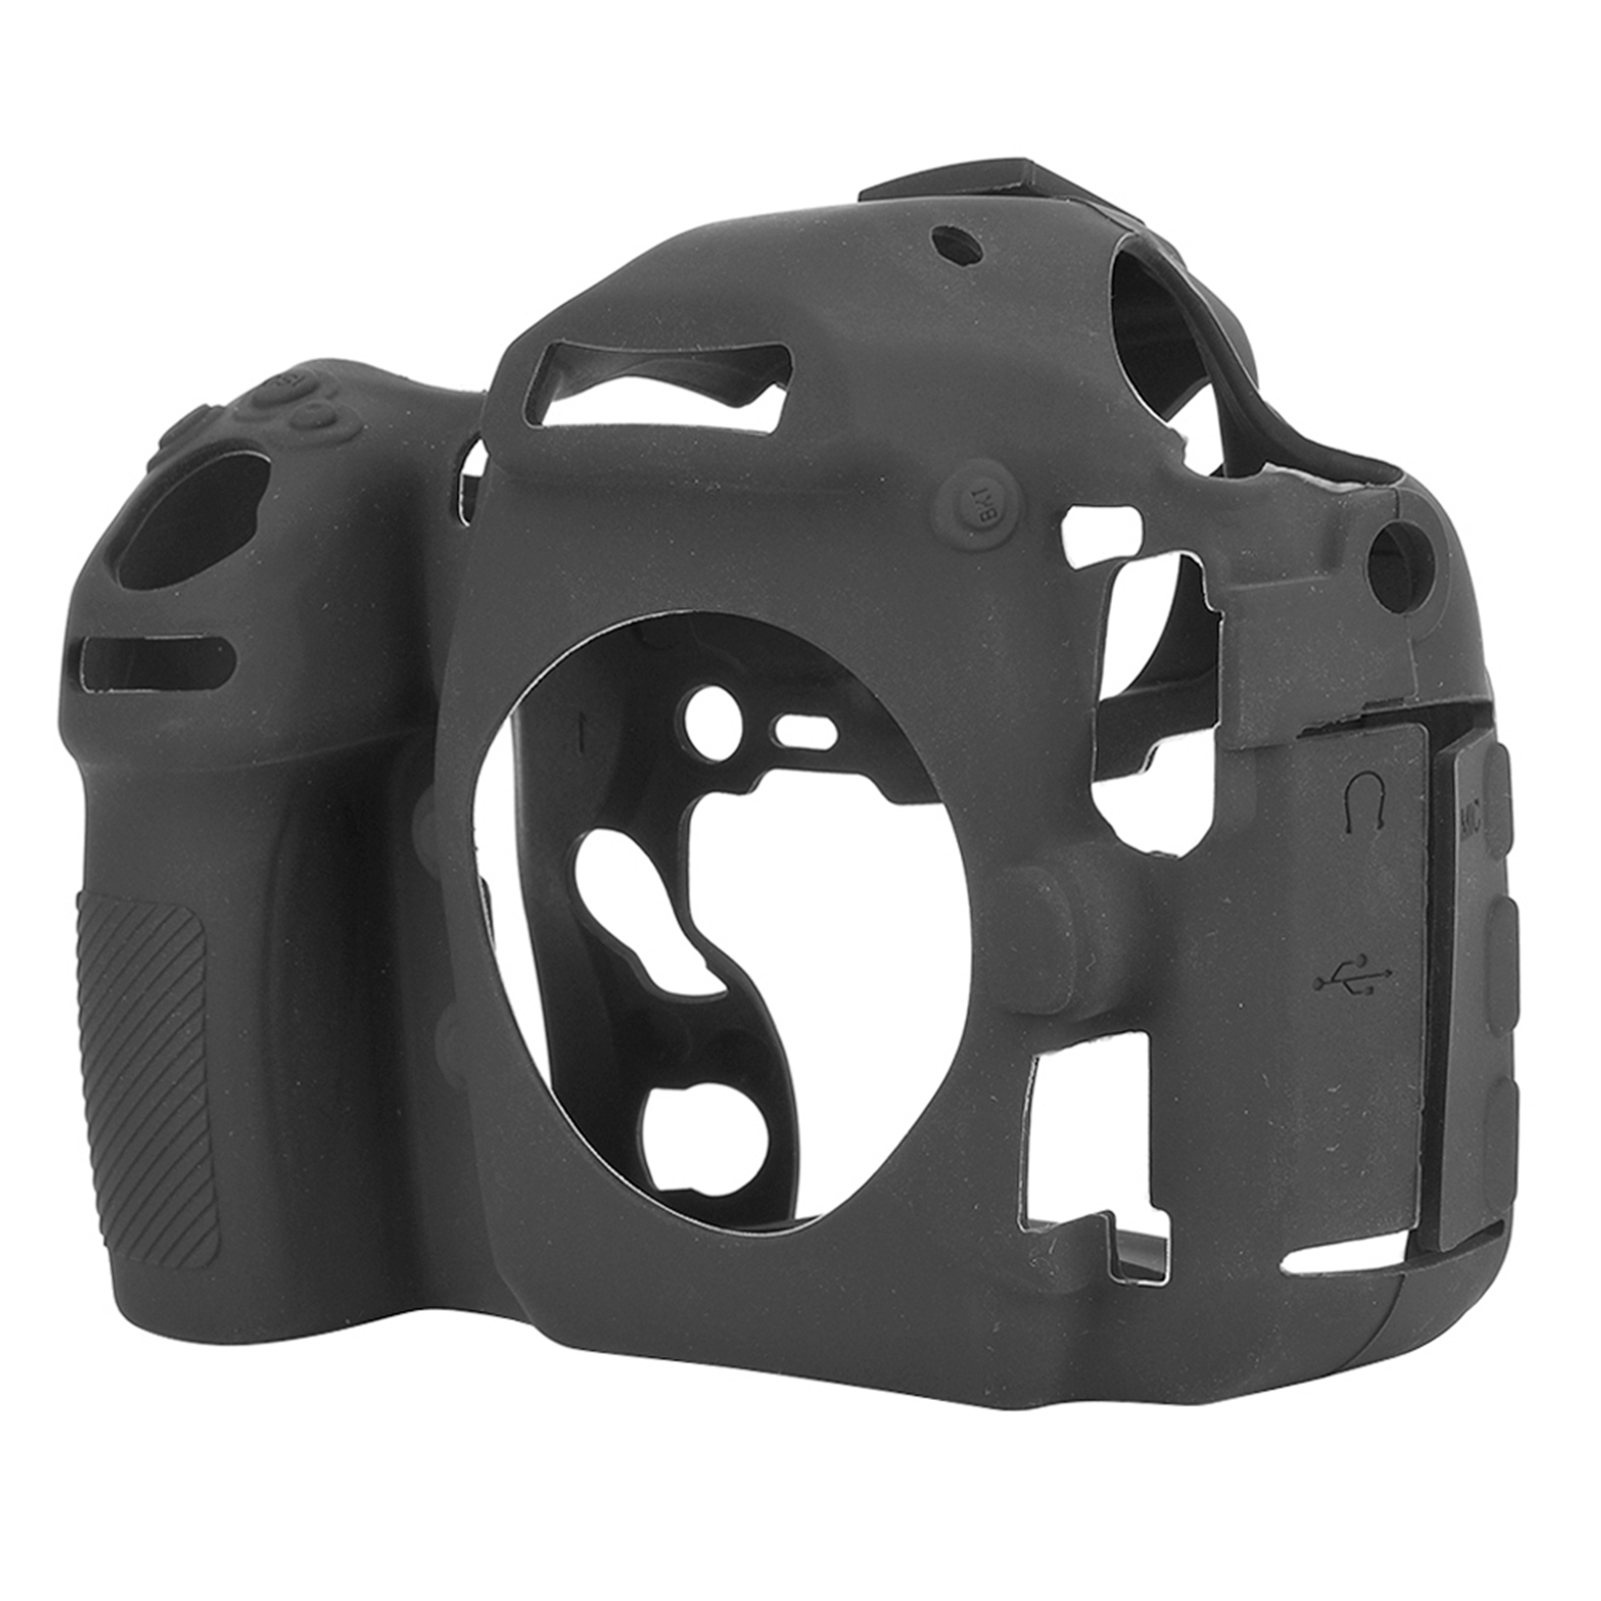 Funda-de-Silicona-Suave-a-Prueba-De-Golpes-Funda-Protectora-De-Camara-Para-Nikon-D5300-D7500-D3400 miniatura 32